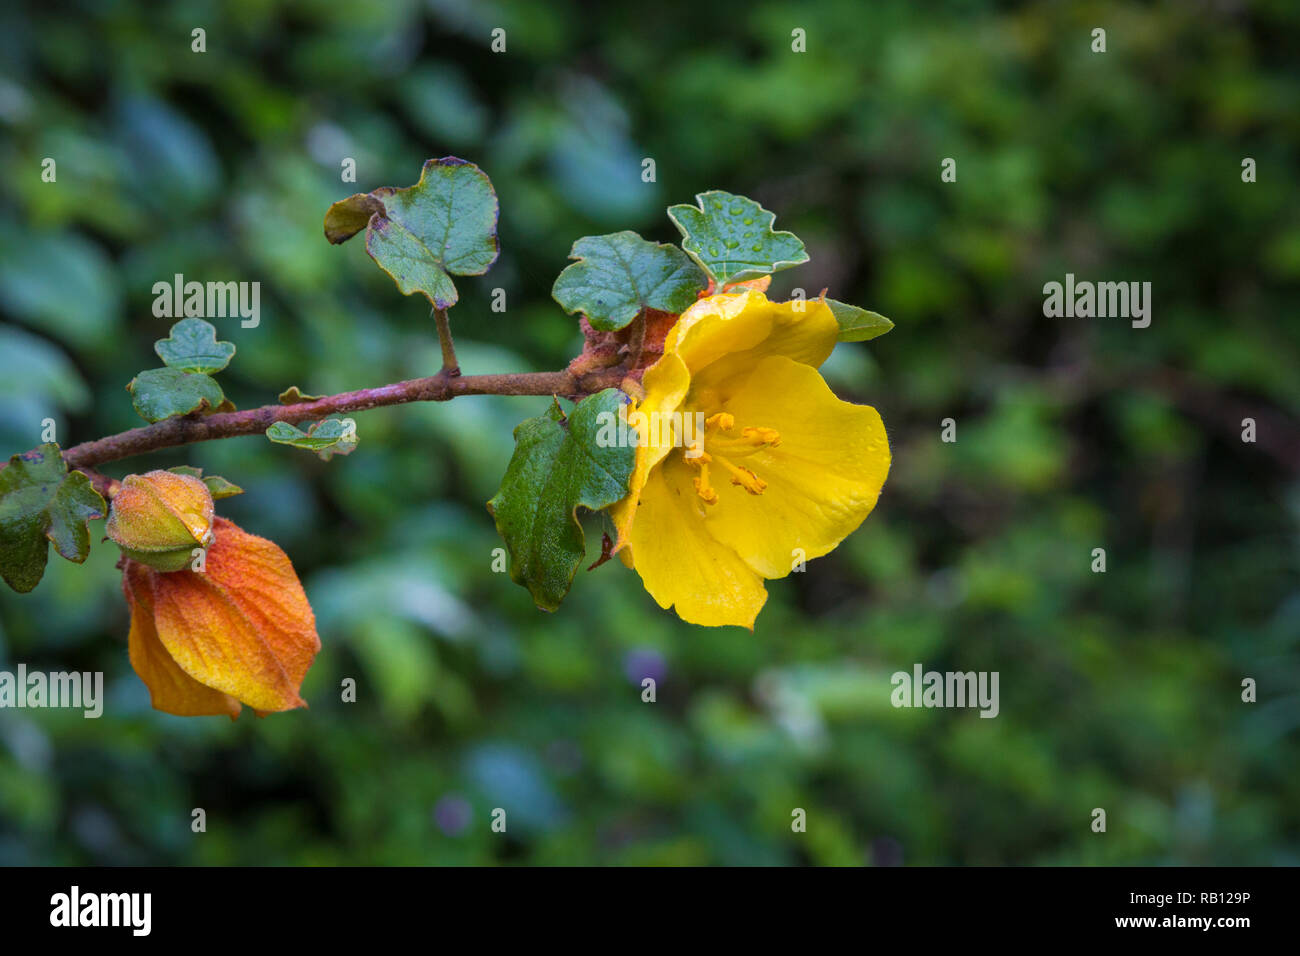 Gelbe Blume Stock Photos Gelbe Blume Stock Images Alamy